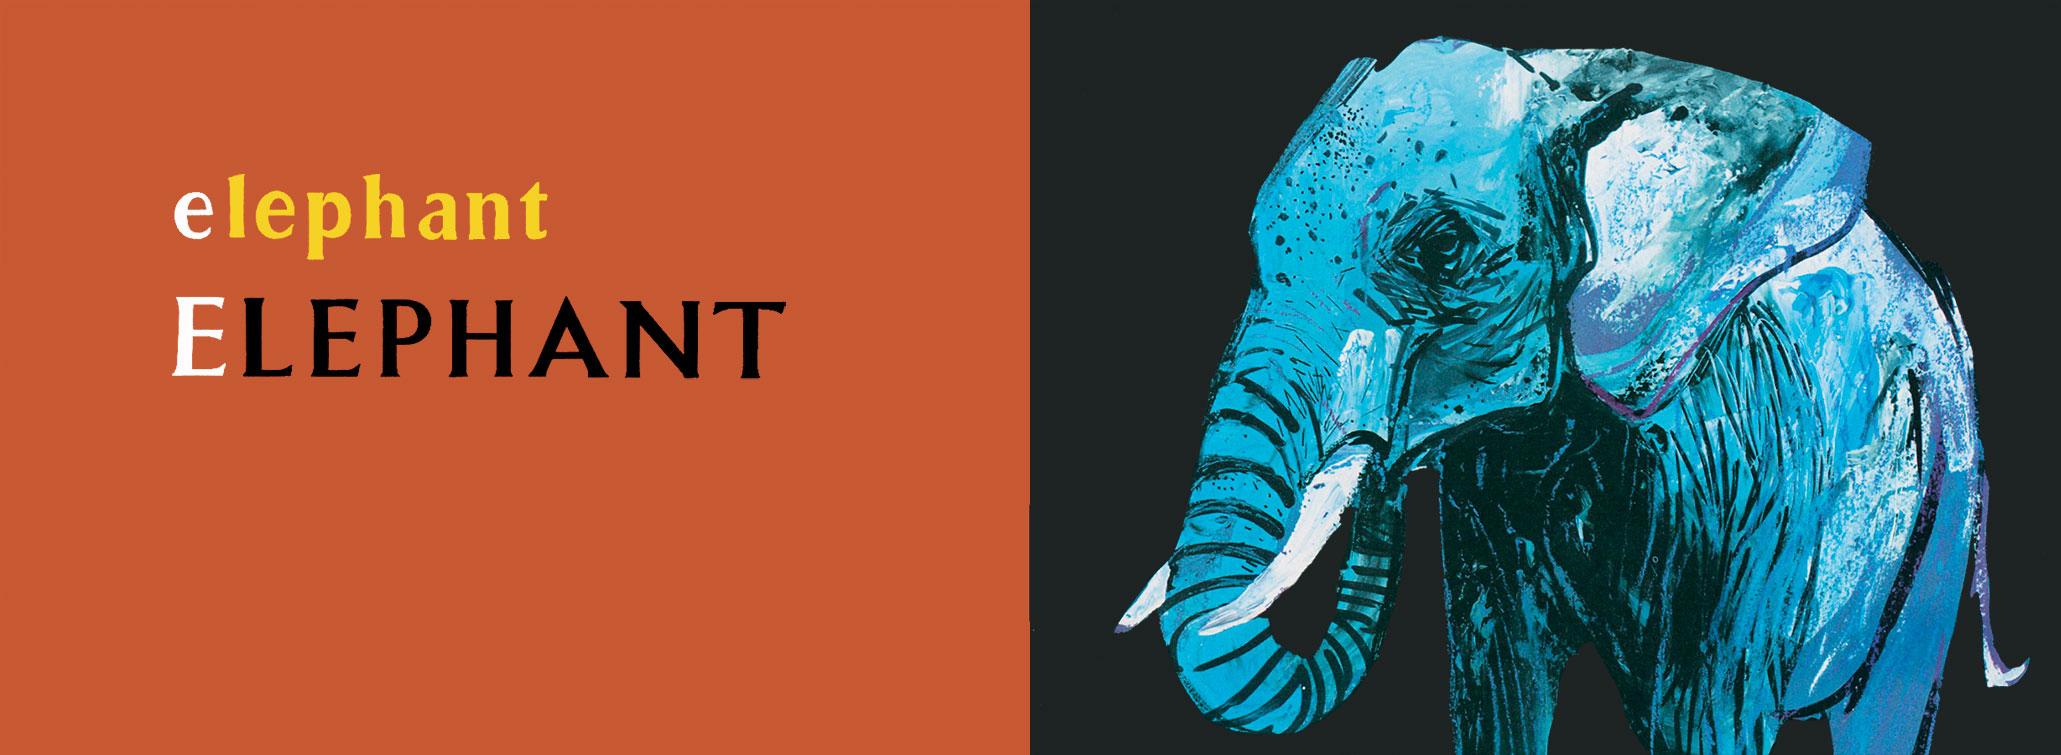 e-for-elephant-brian-wildsmith-ABC.jpg